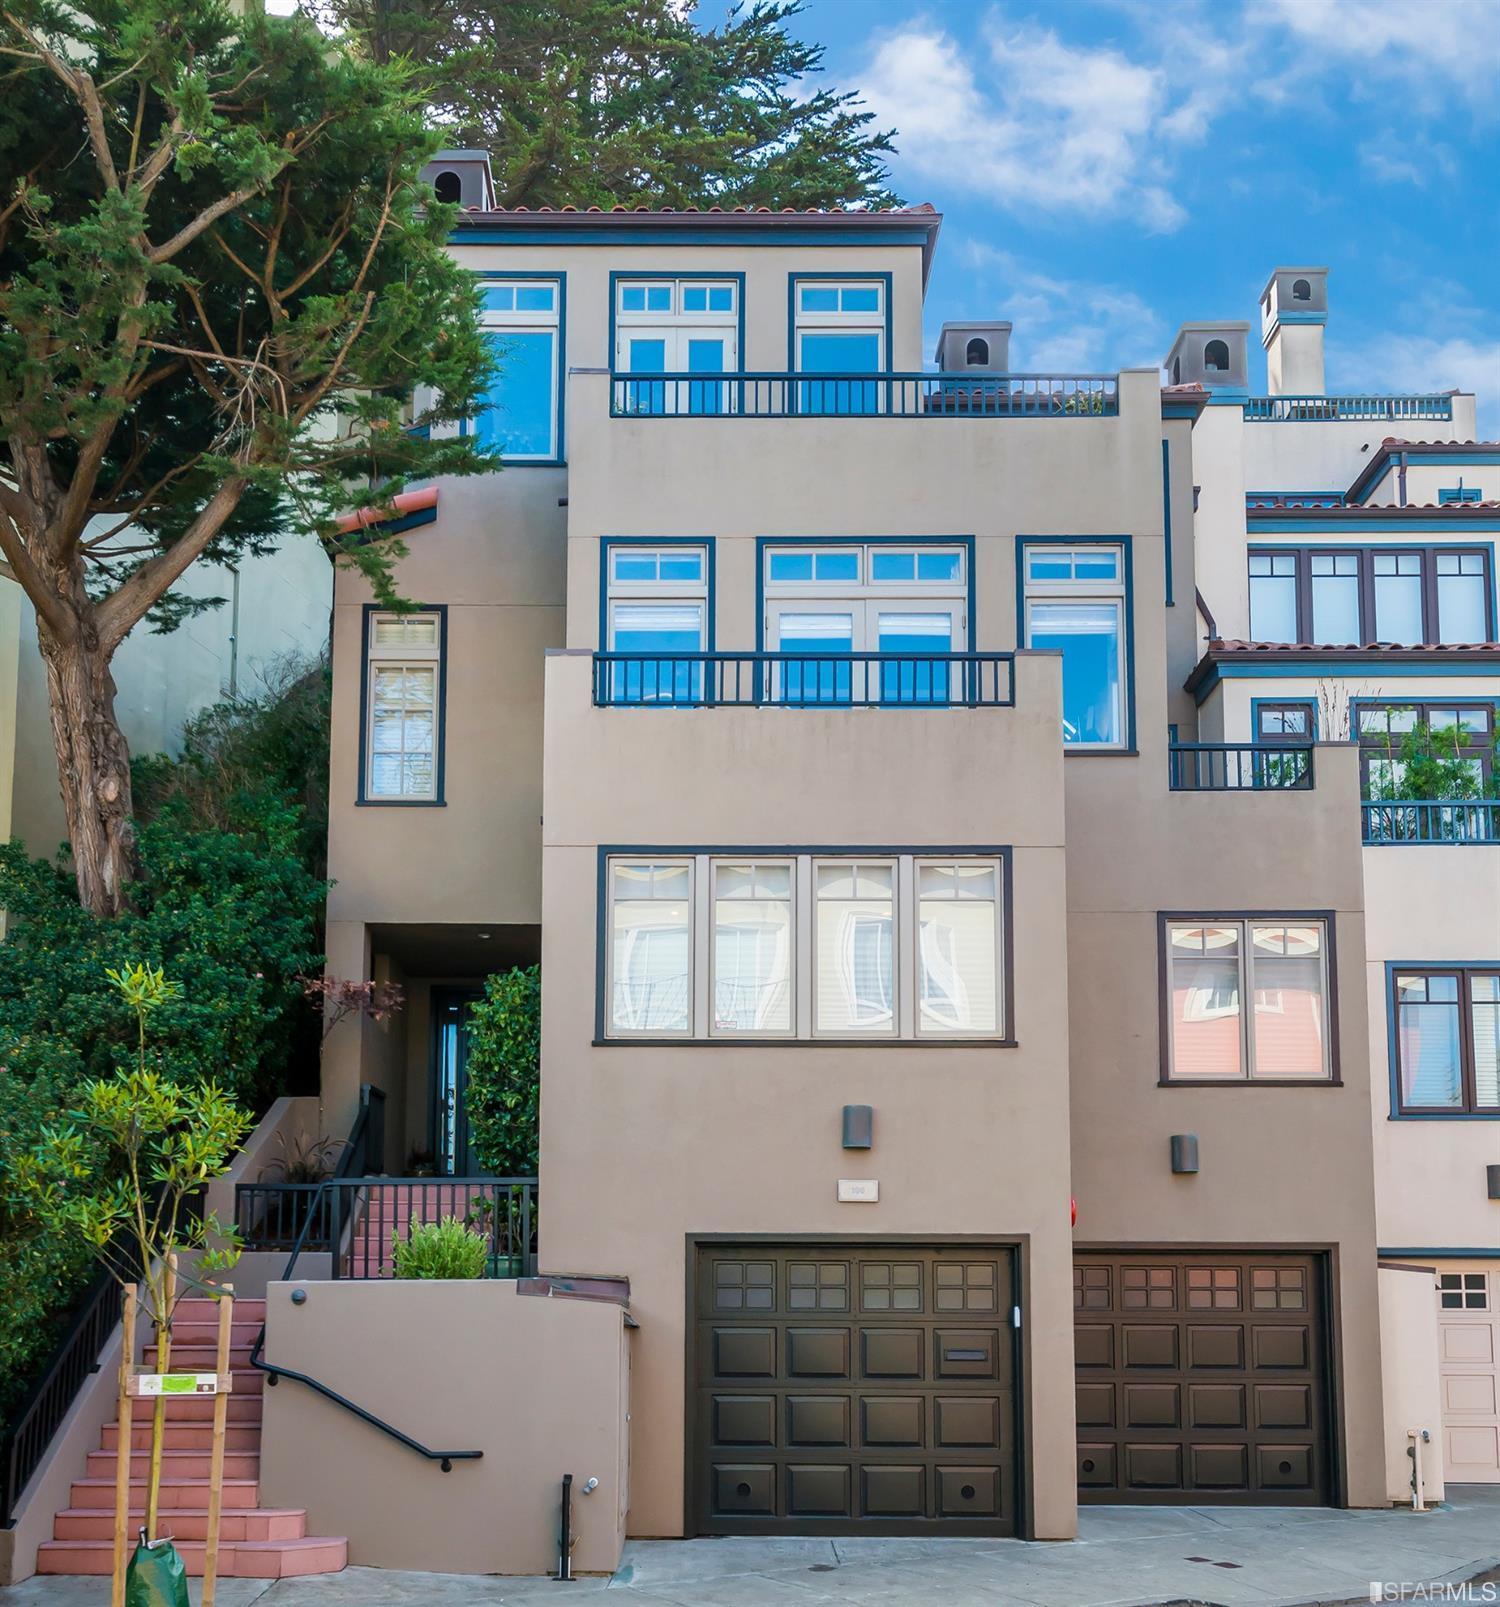 196 Graystone Terrace, San Francisco, CA 94114